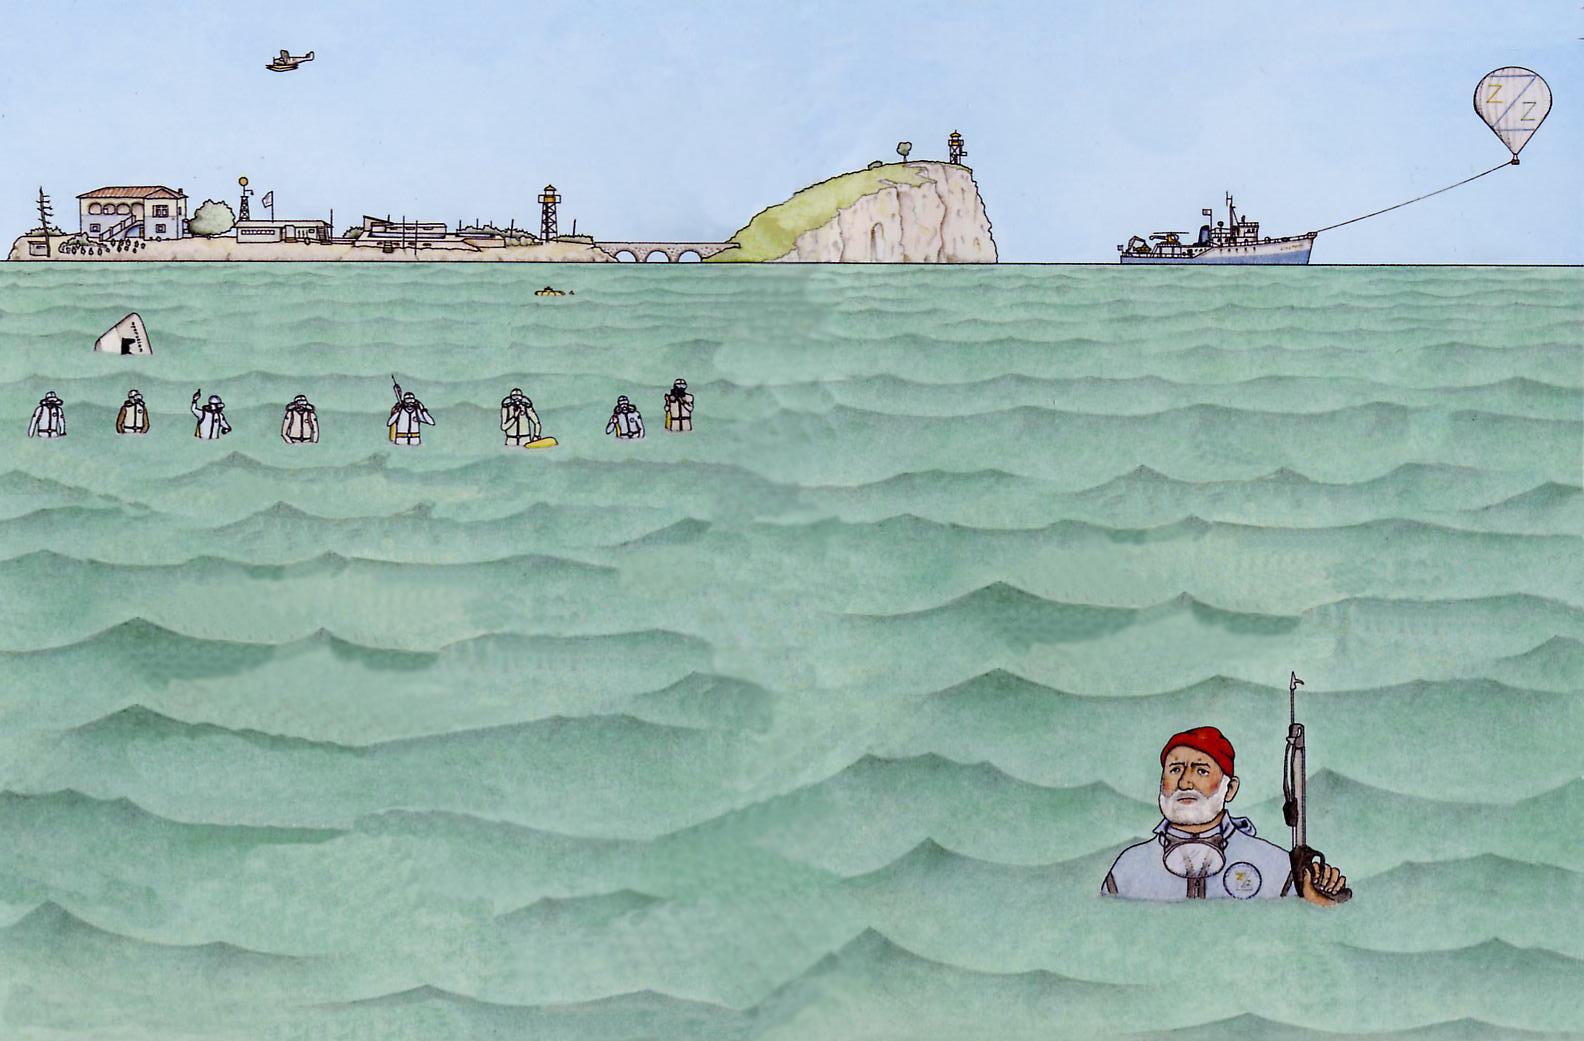 Aquatic Wallpaper by ~JAllenLang on deviantART